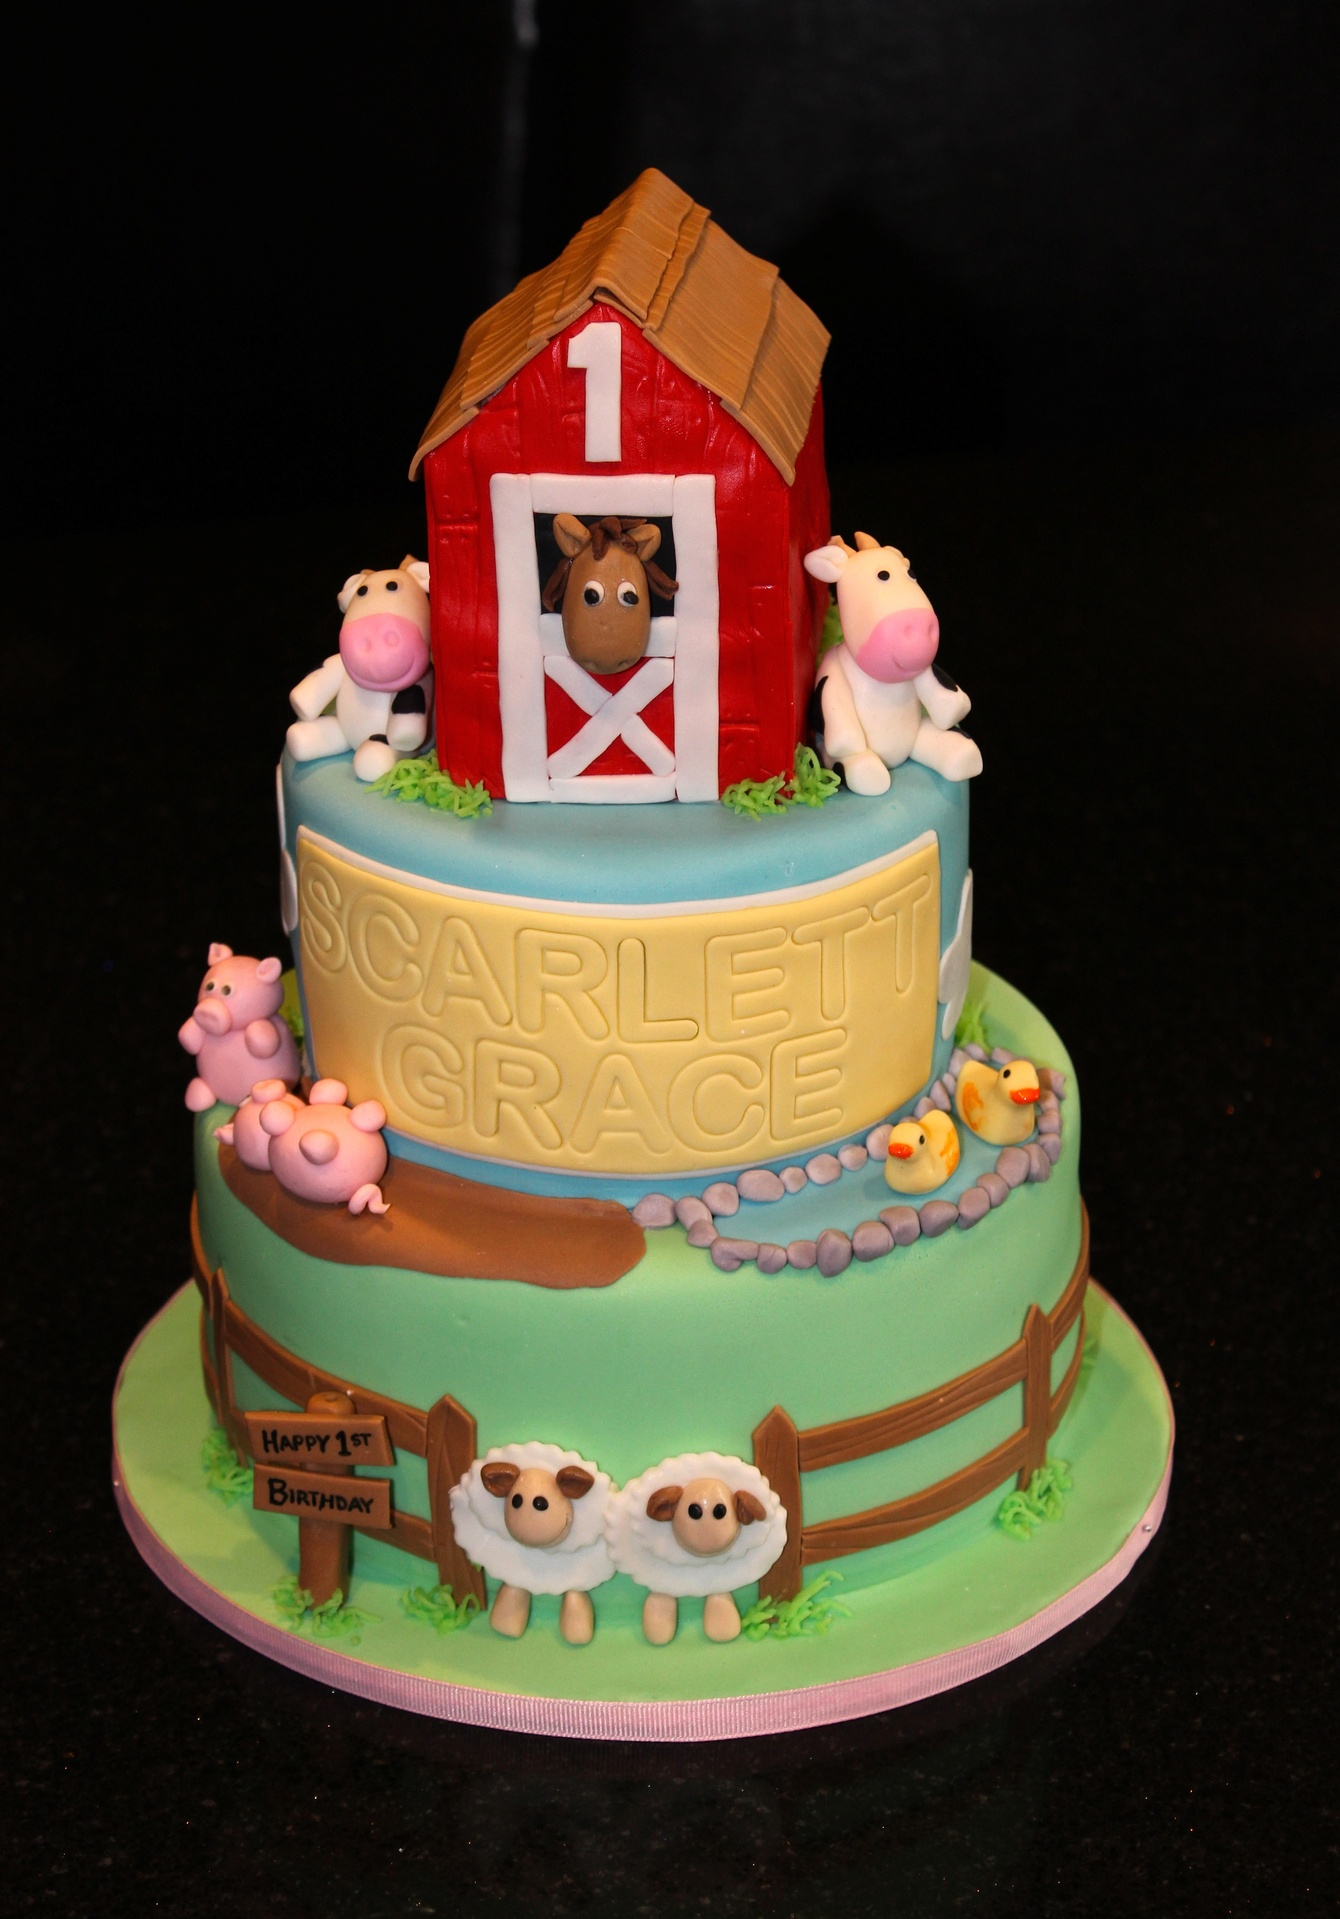 3 Tiered Farm Theme 1st Birthday Cake